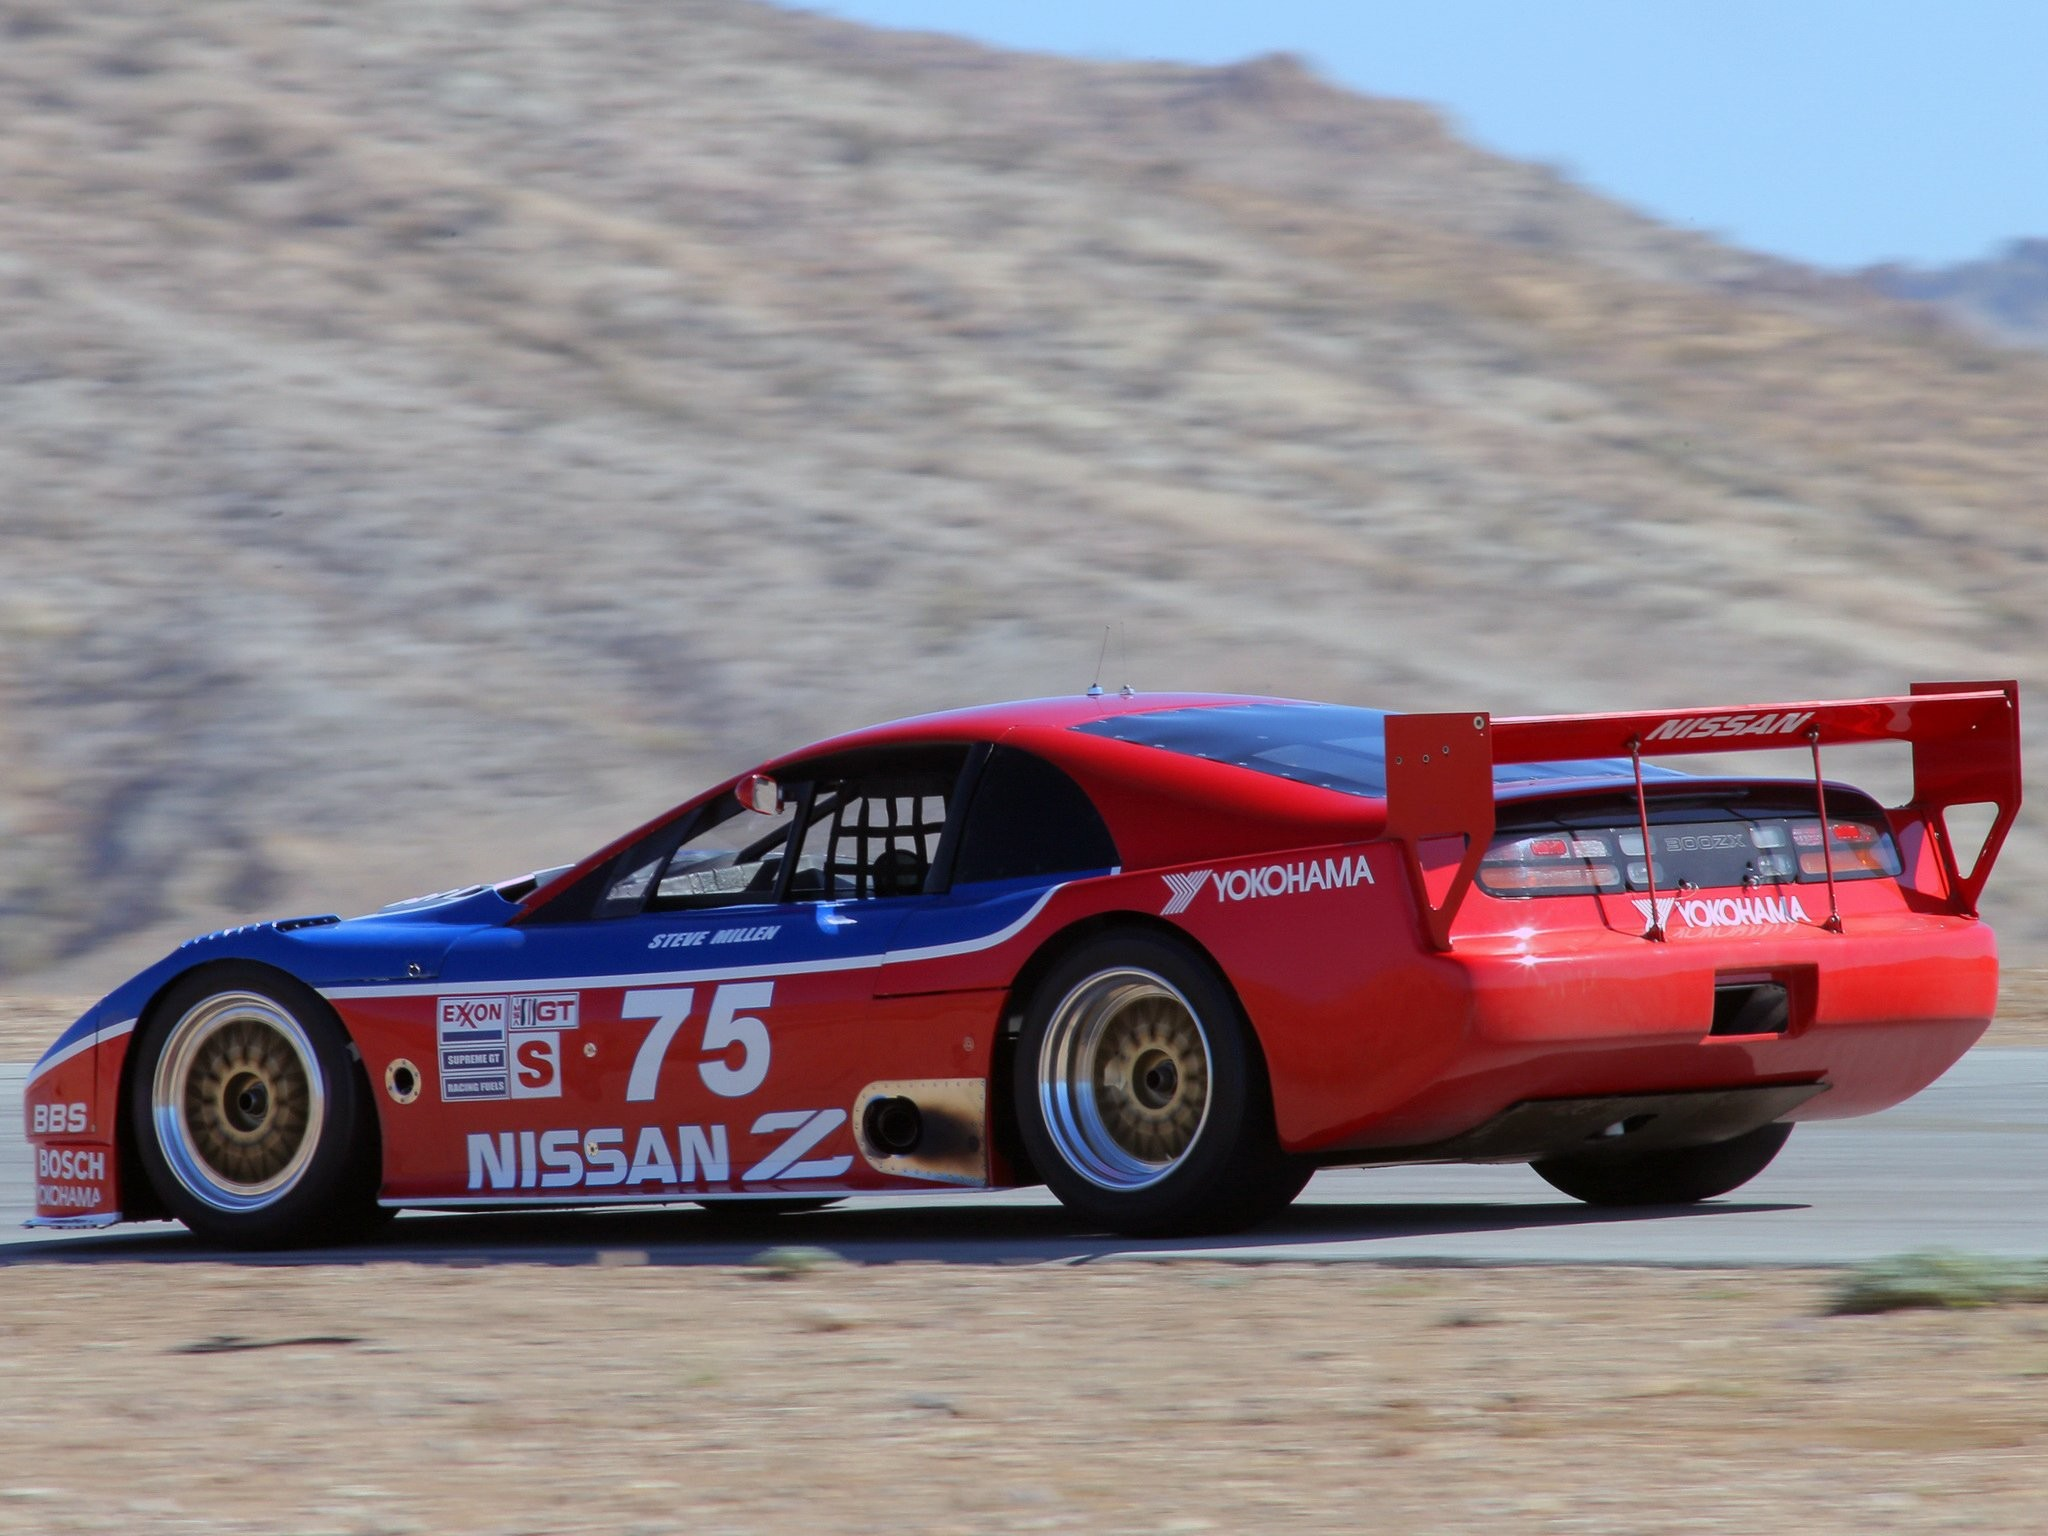 1994 Nissan GTS 300ZX Twin Turbo IMSA G-T Challenge (Z32) race racing  wallpaper | | 436273 | WallpaperUP